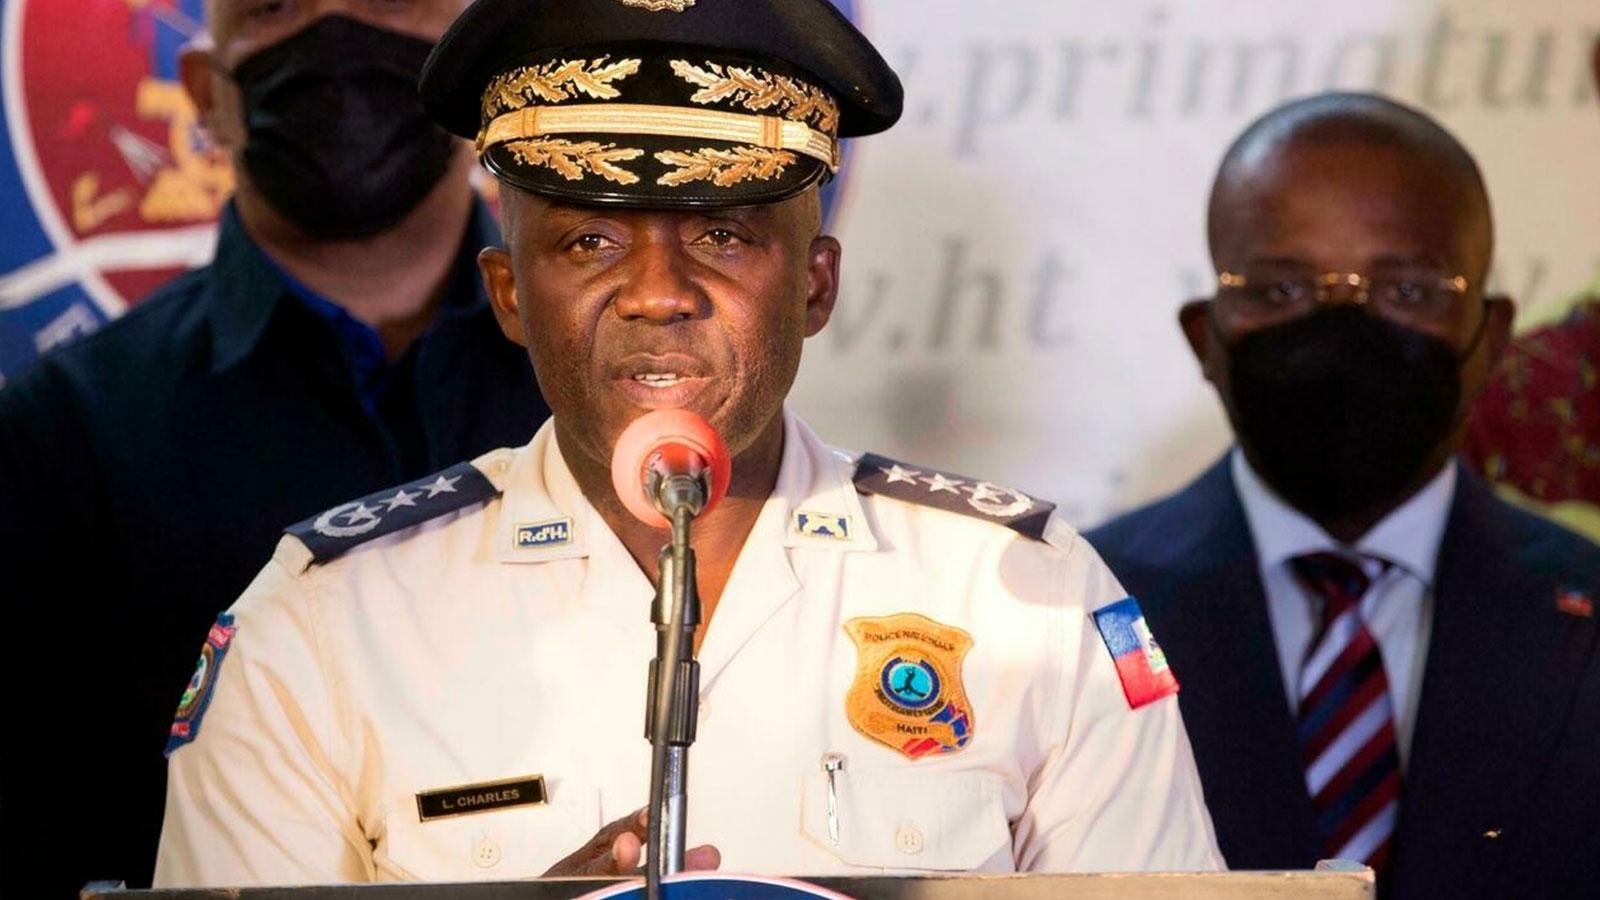 National Police Director Leon Charles, Port-au-Prince, Haiti